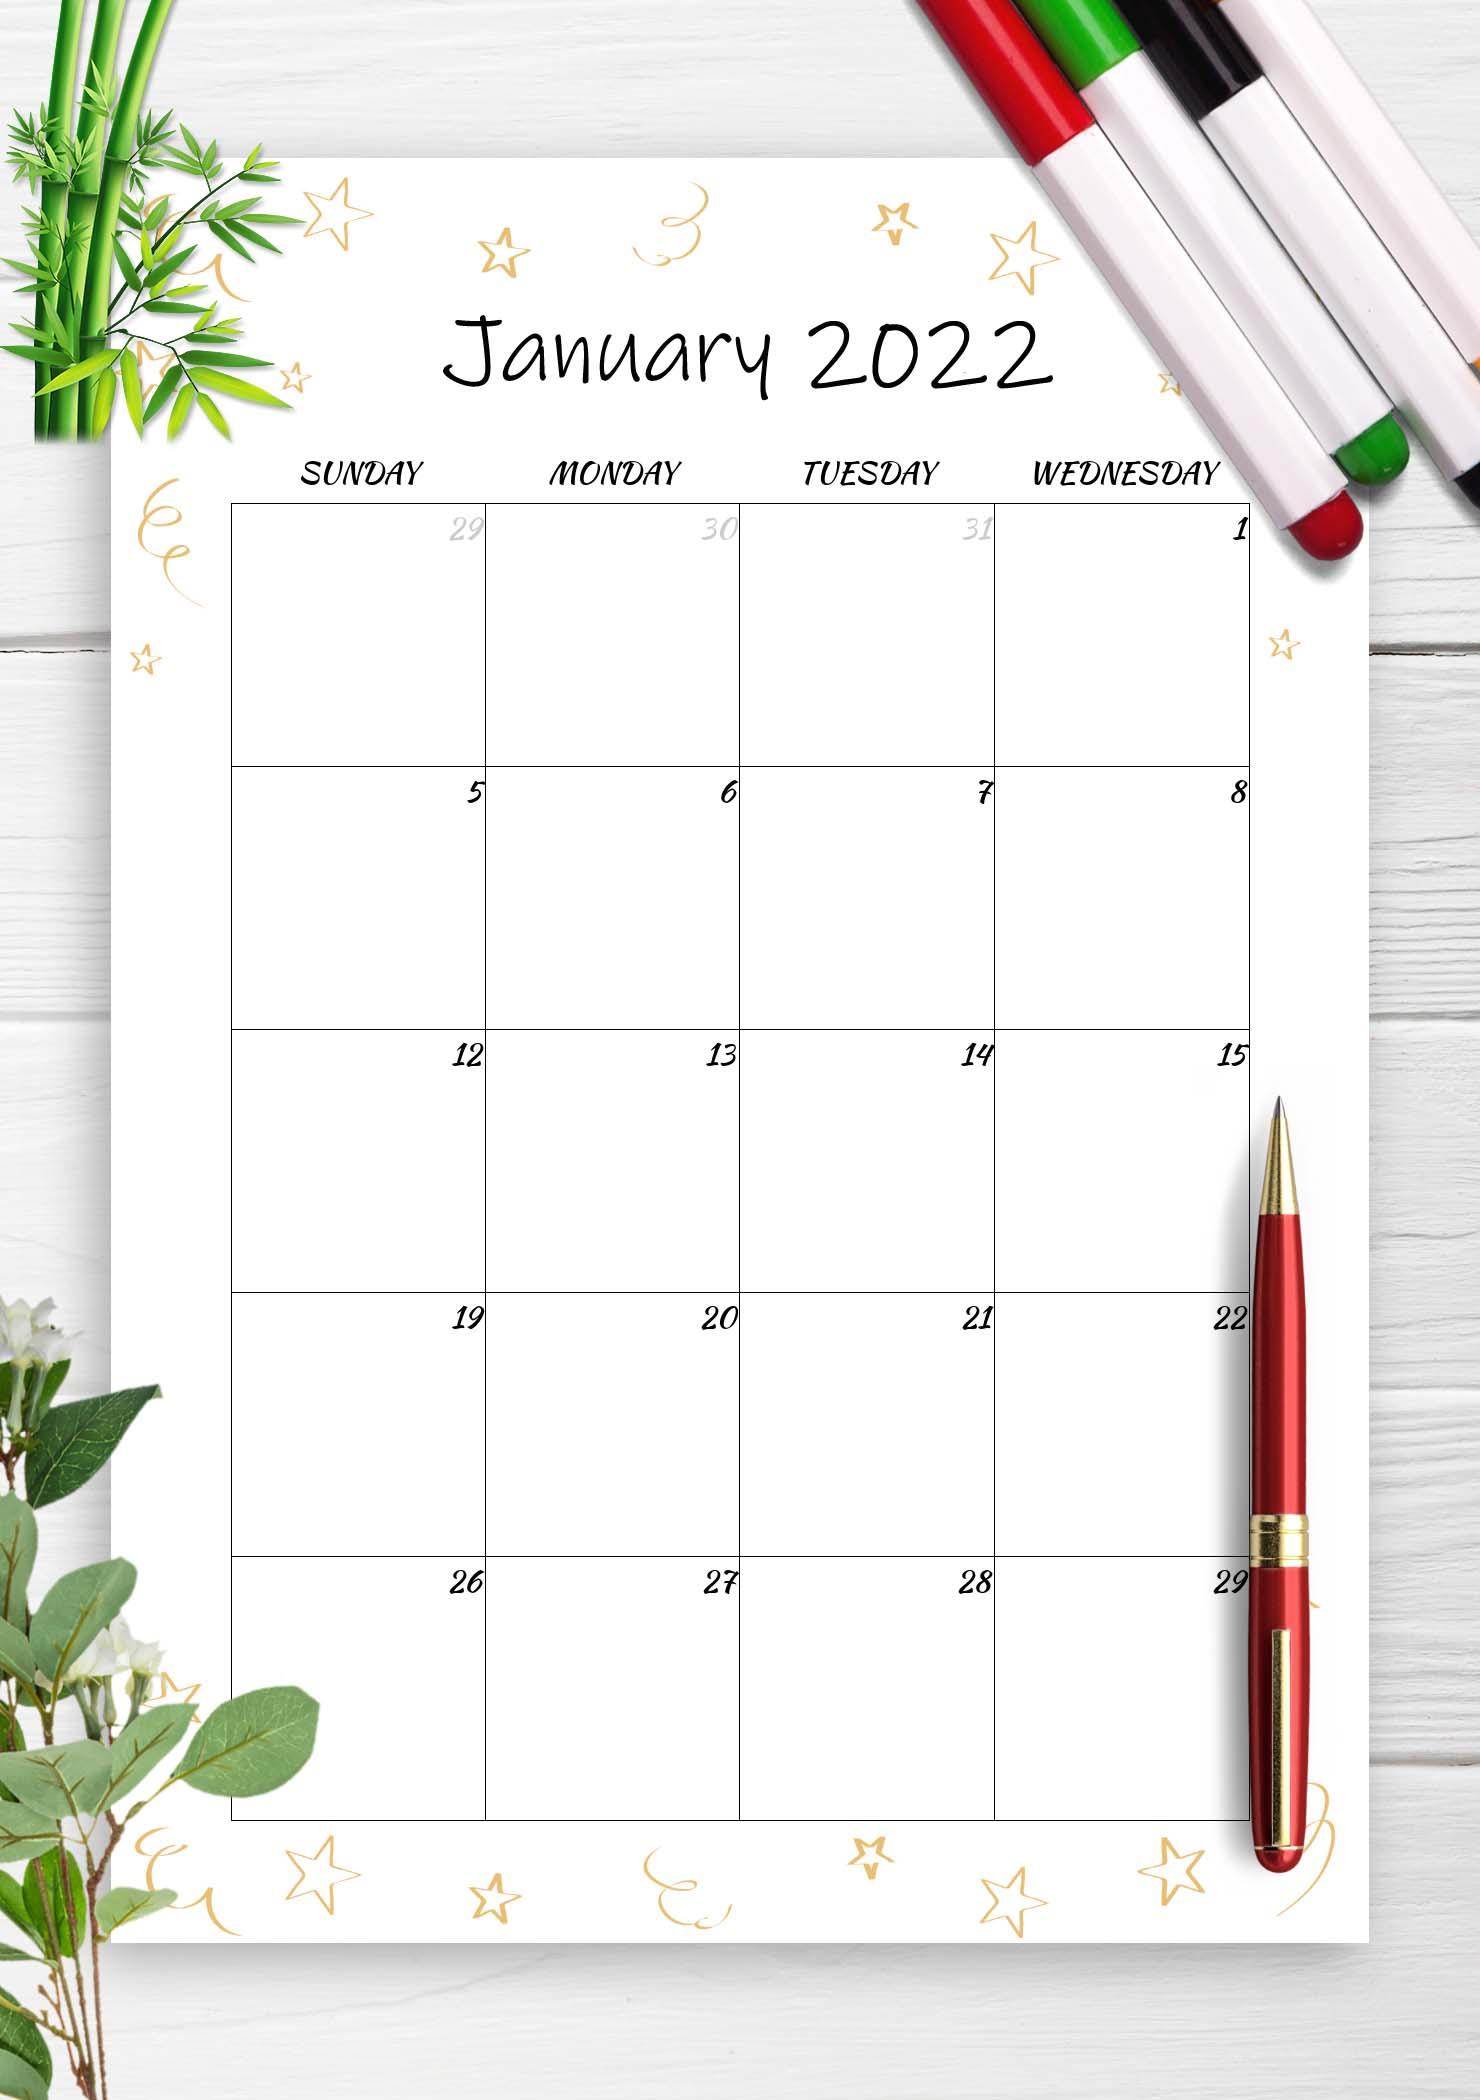 Printable Calendar January 2022 templates